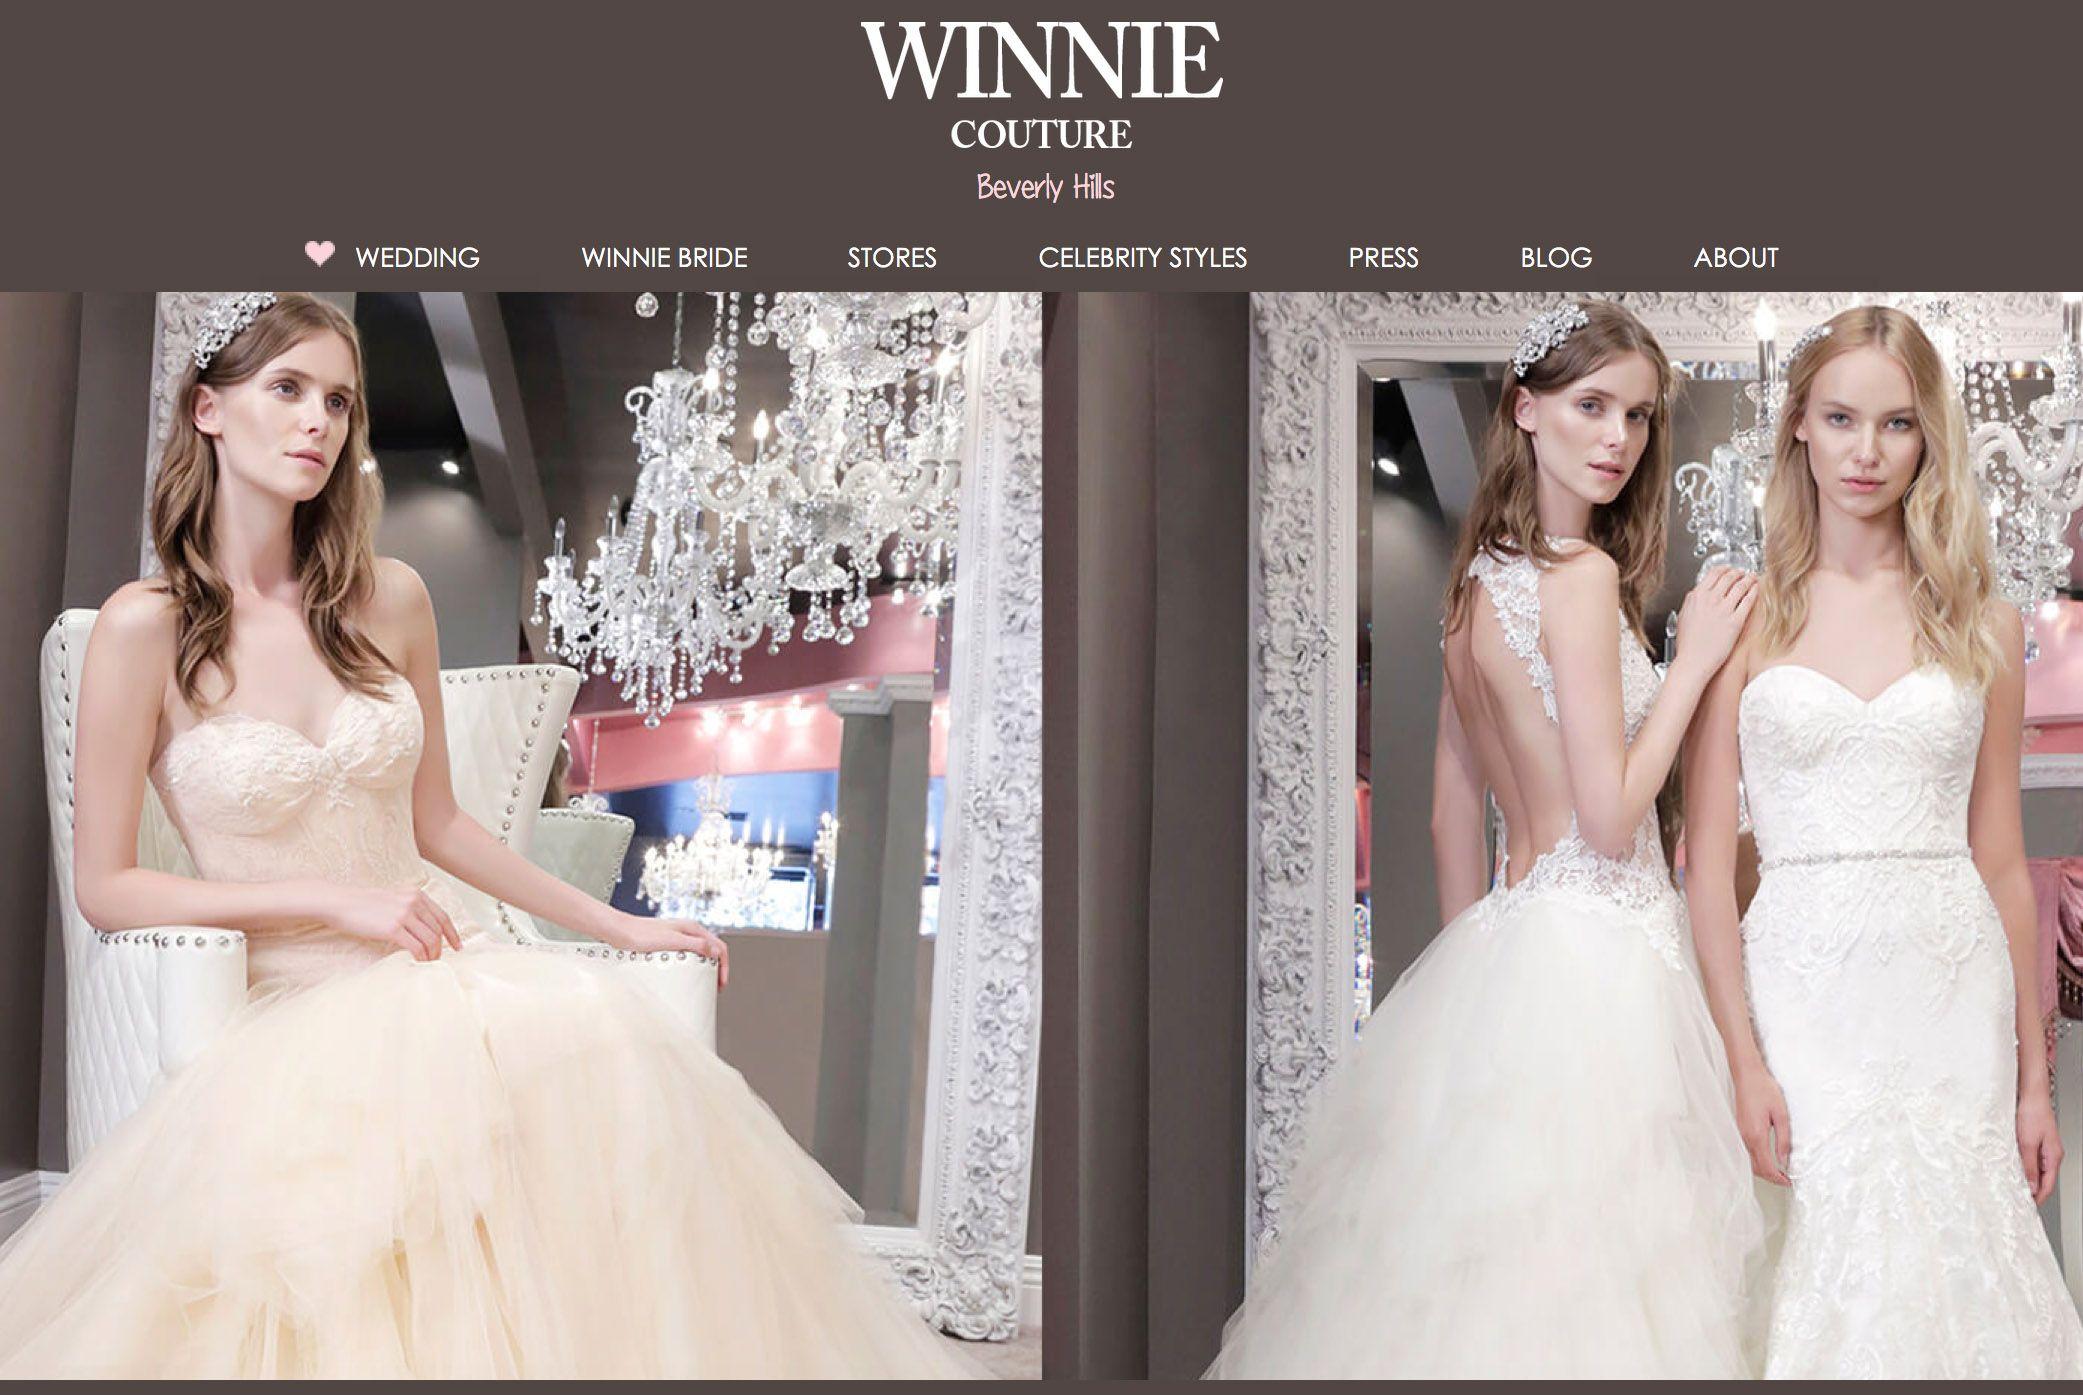 Winnie Couture | Charlotte, NC Bridal Shop | Charlotte, NC Wedding ...